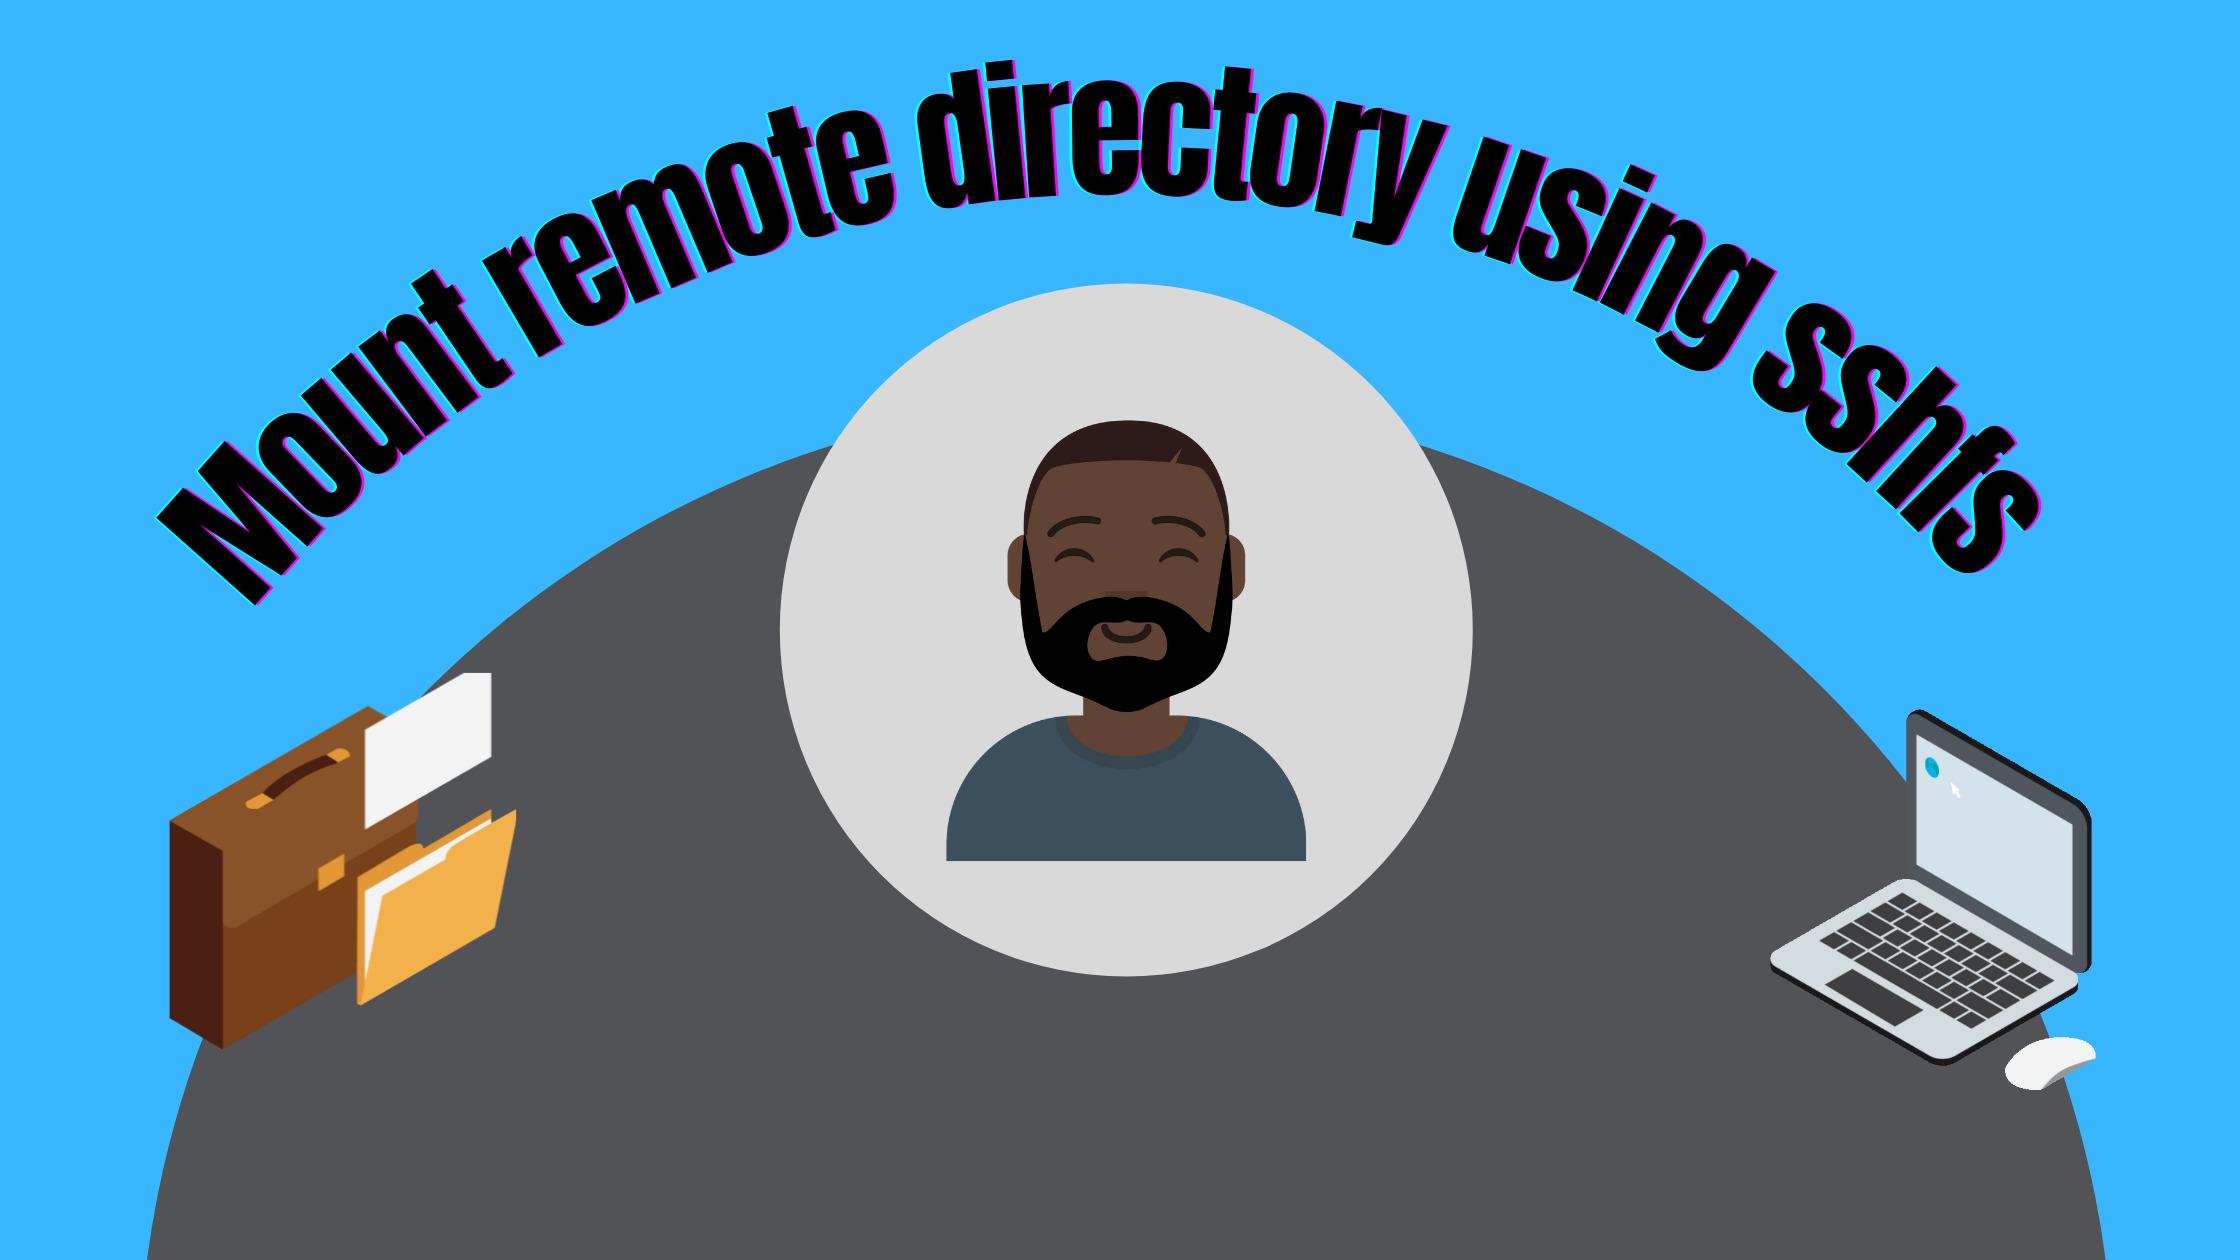 Mount remote directory using sshfs